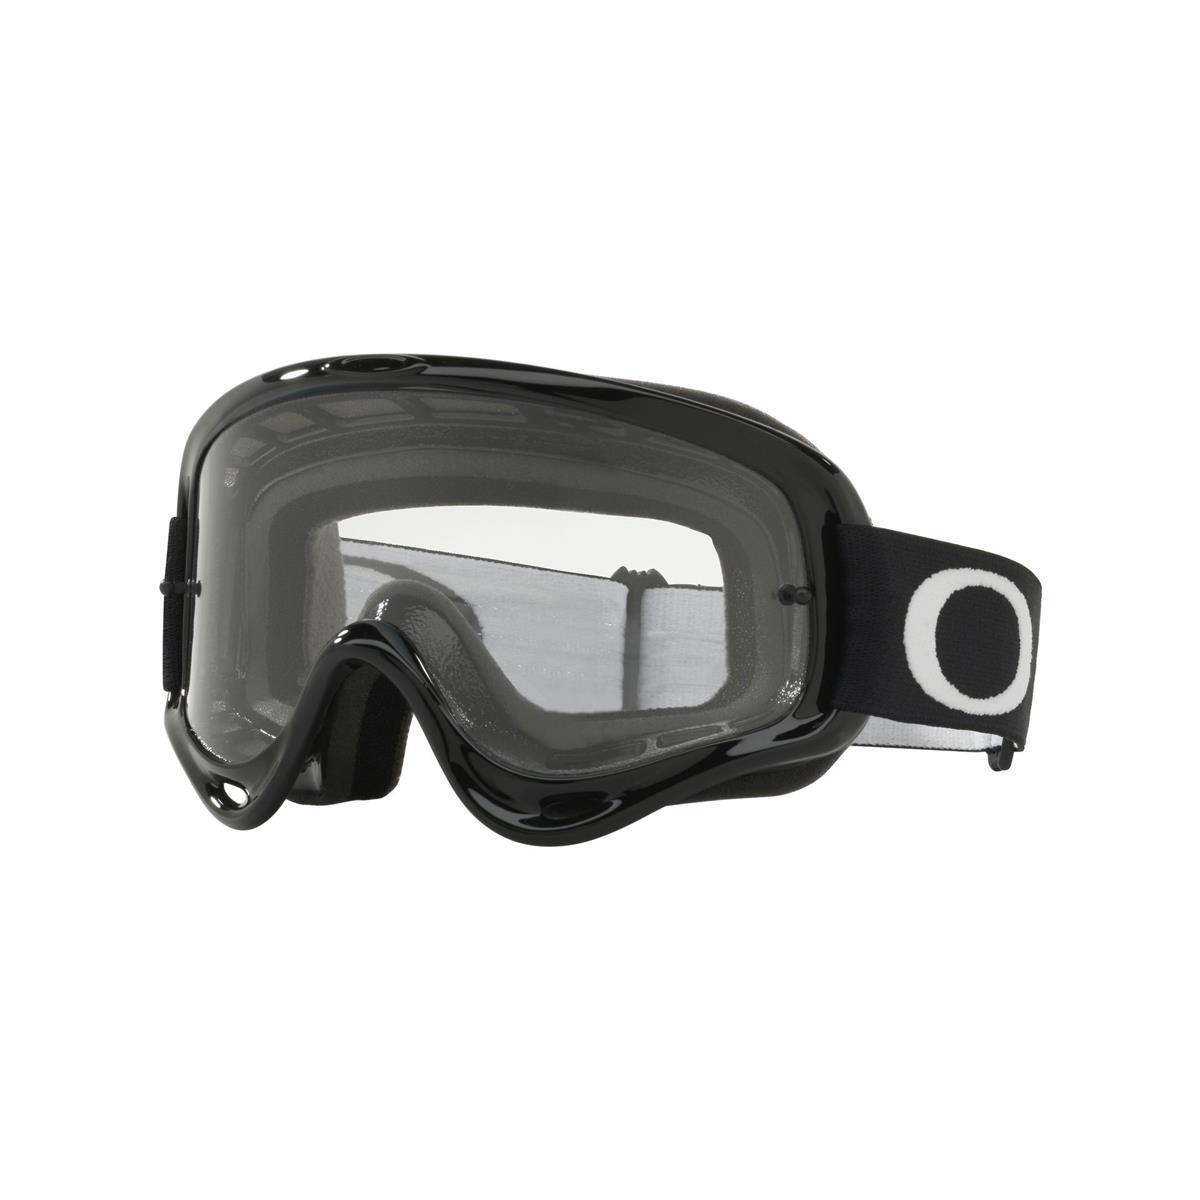 e8dbc586f7 Oakley MX Goggle O Frame MX Jet Black - Clear 2019